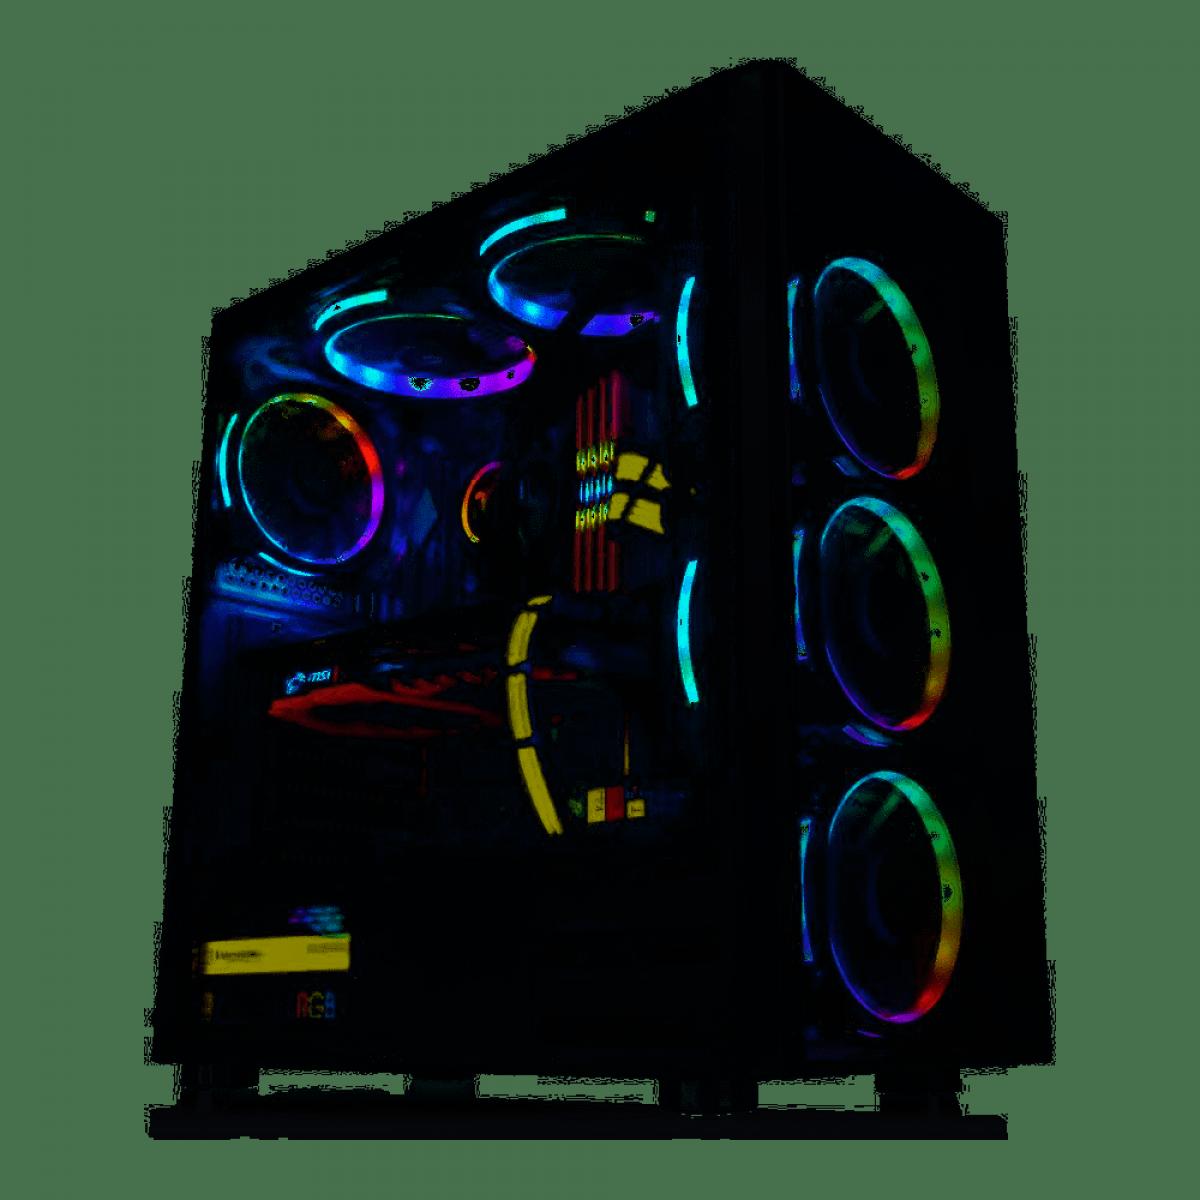 Gabinete Gamer Thermaltake V200, Mid Tower, Sem Fan, Vidro temperado, Black, Sem Fonte, CA-3K8-50M1WZ-01